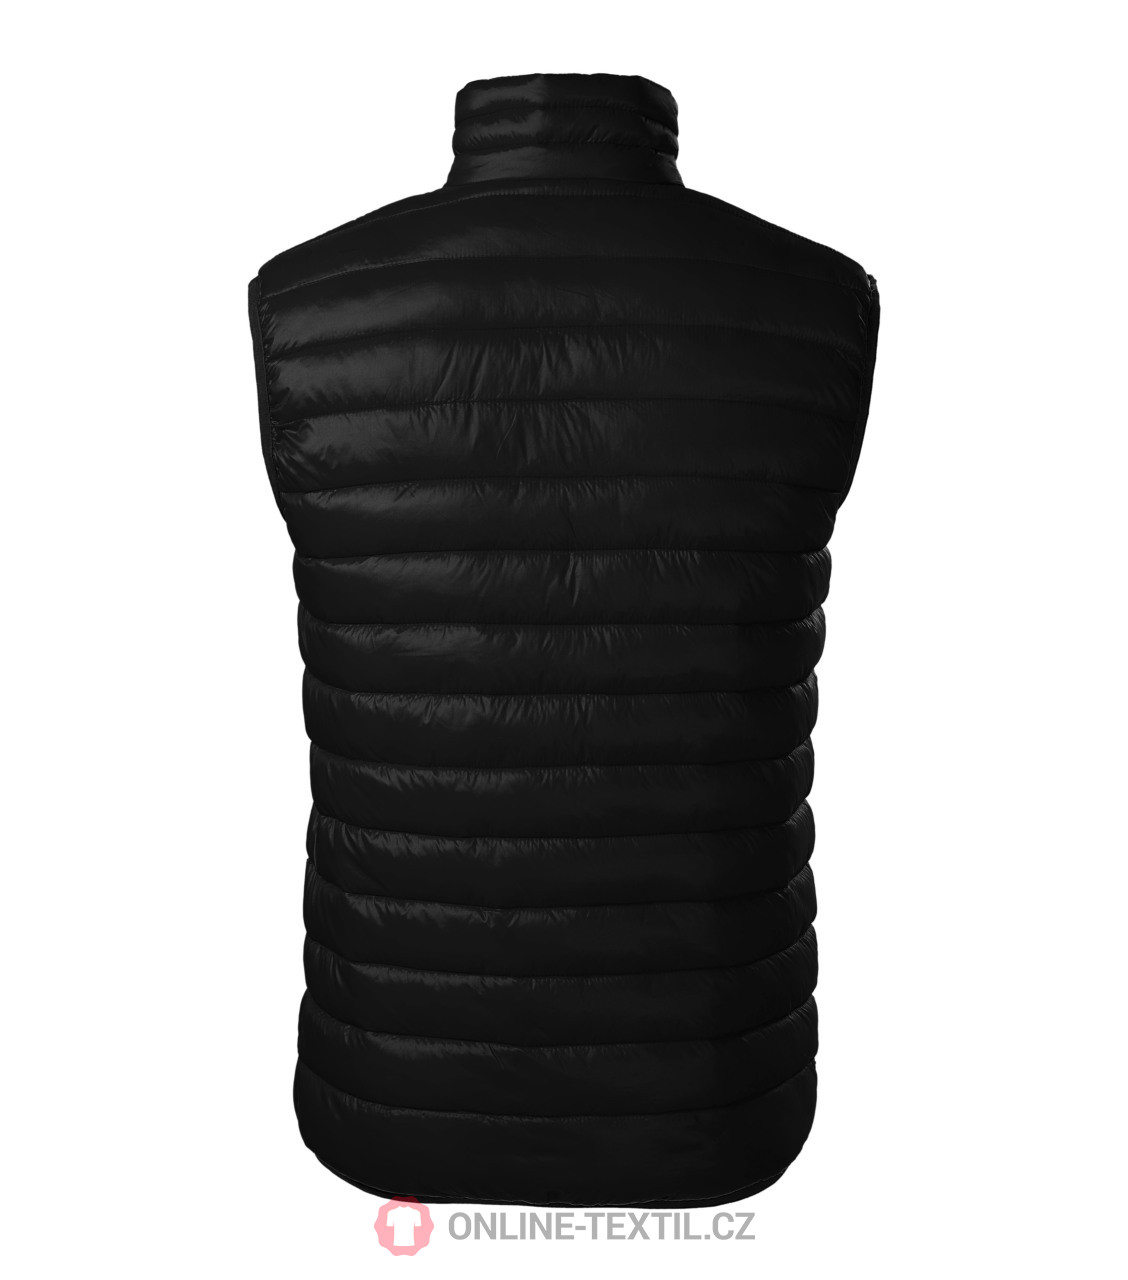 18c609028 ADLER CZECH Prémiová pánska prešívaná vesta Everest 553 - čierna z ...